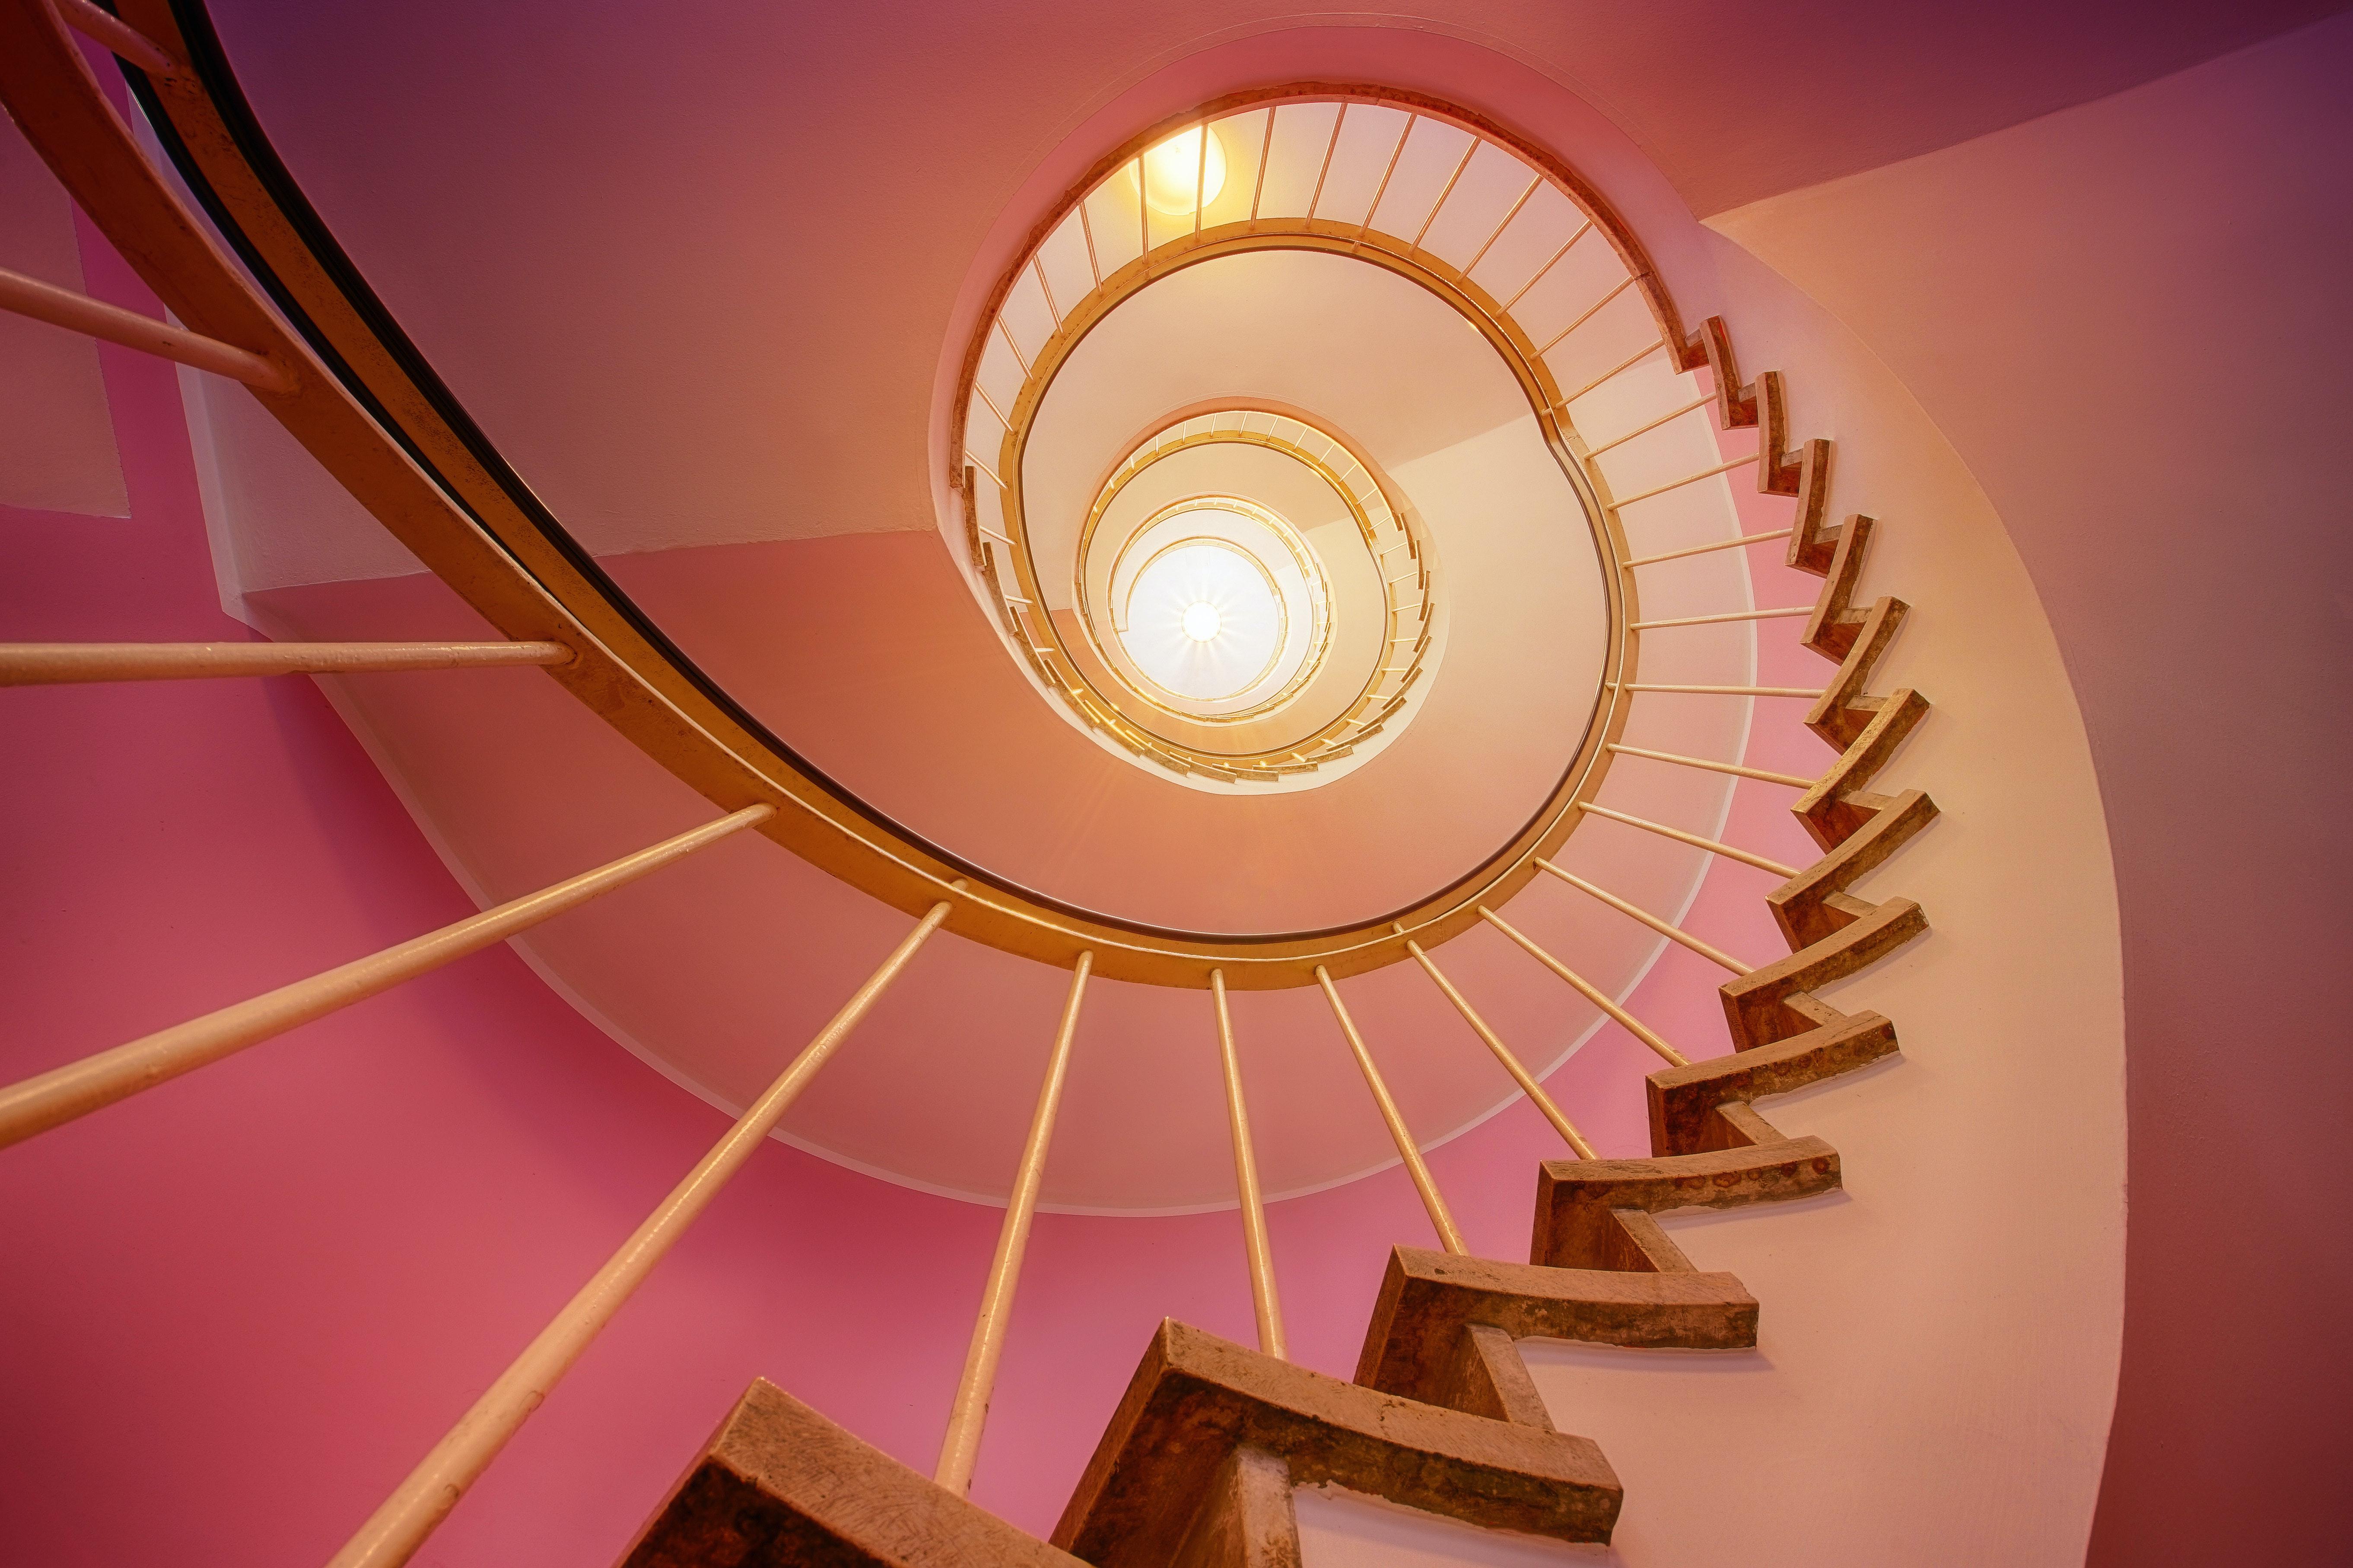 Spiral Staircase Free Stock Photo